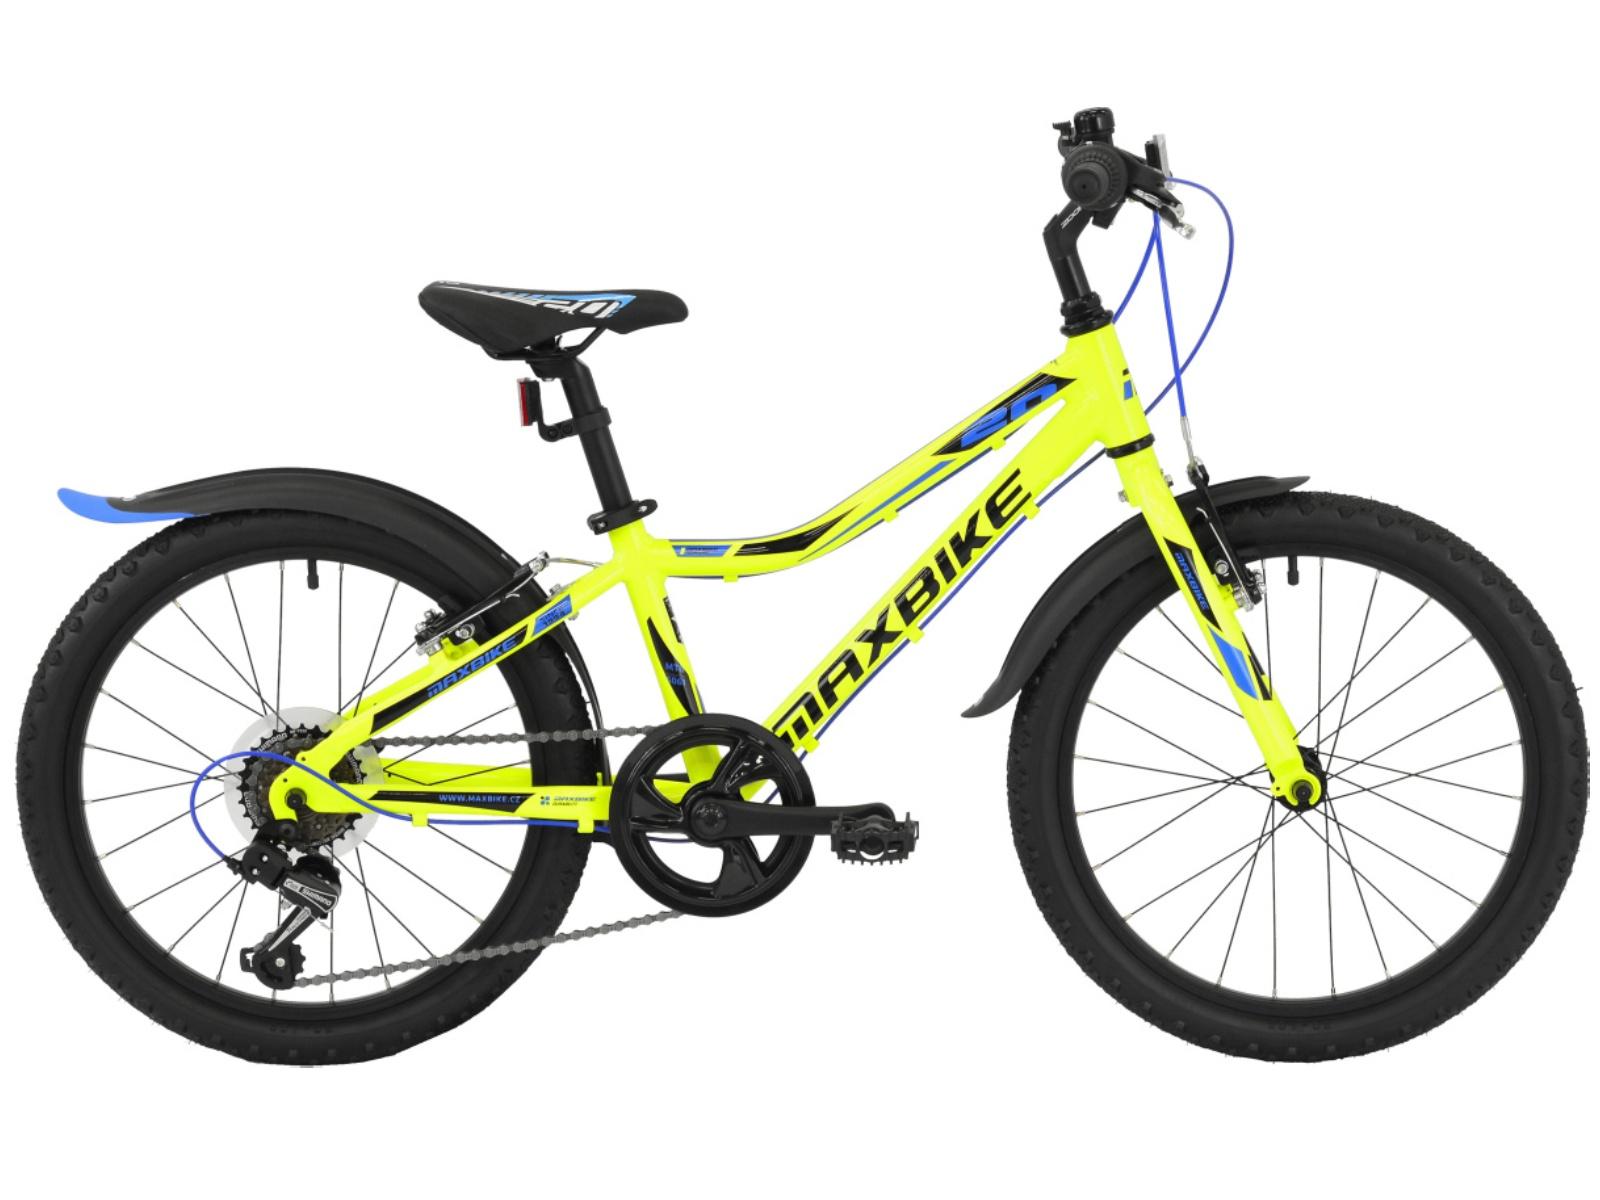 "Detský bicykel MAXBIKE Junior 20 ""- reflexne žltý"